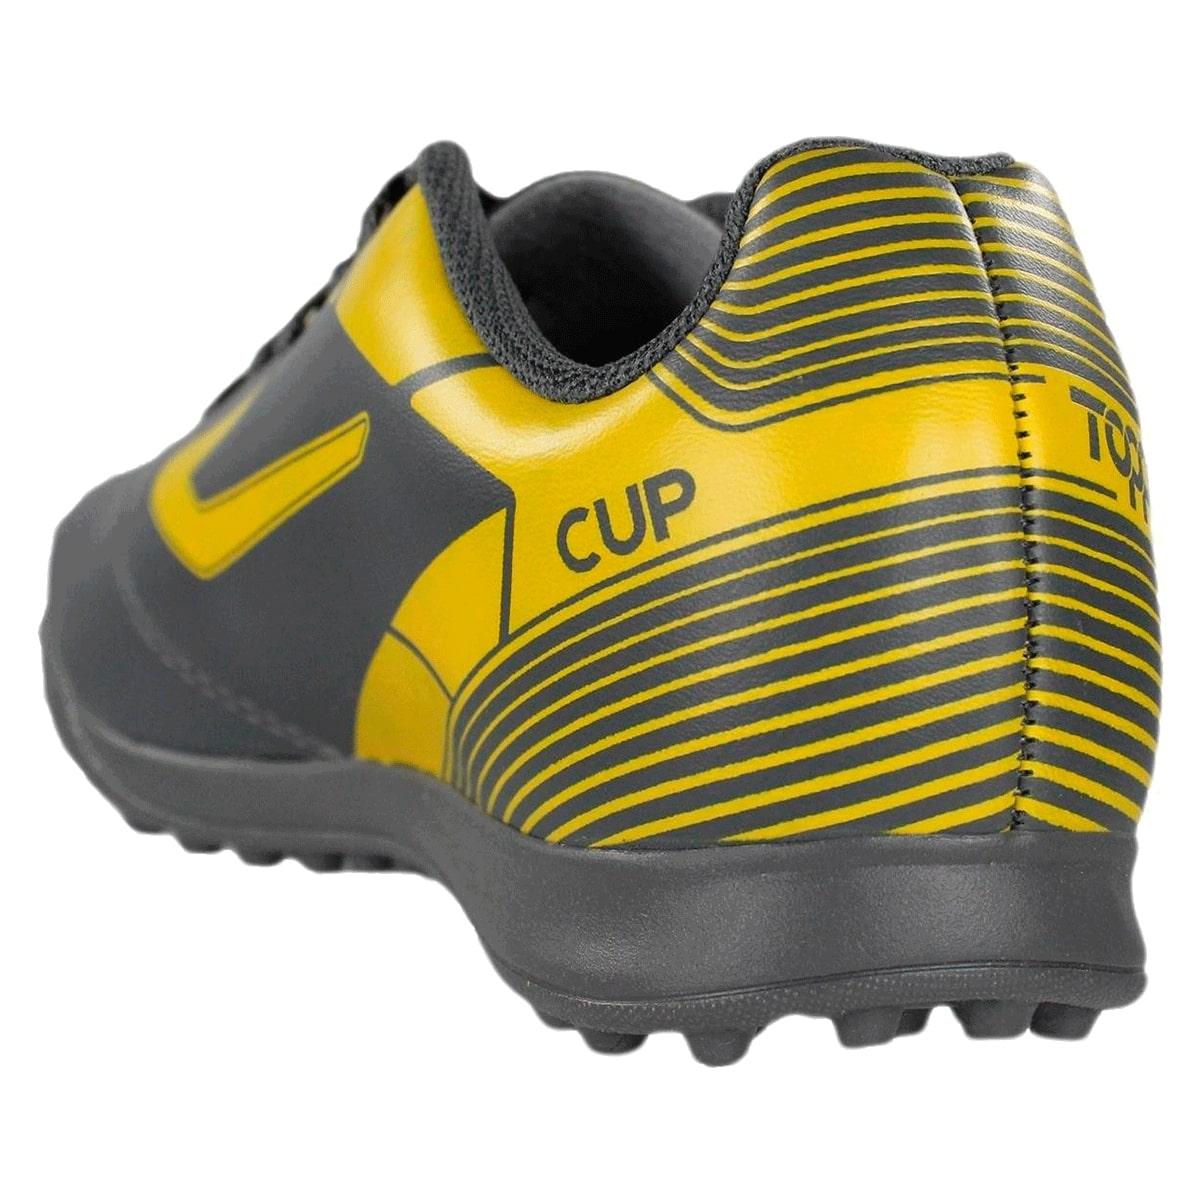 Chuteira Topper Society Cup II Cinza Amarelo